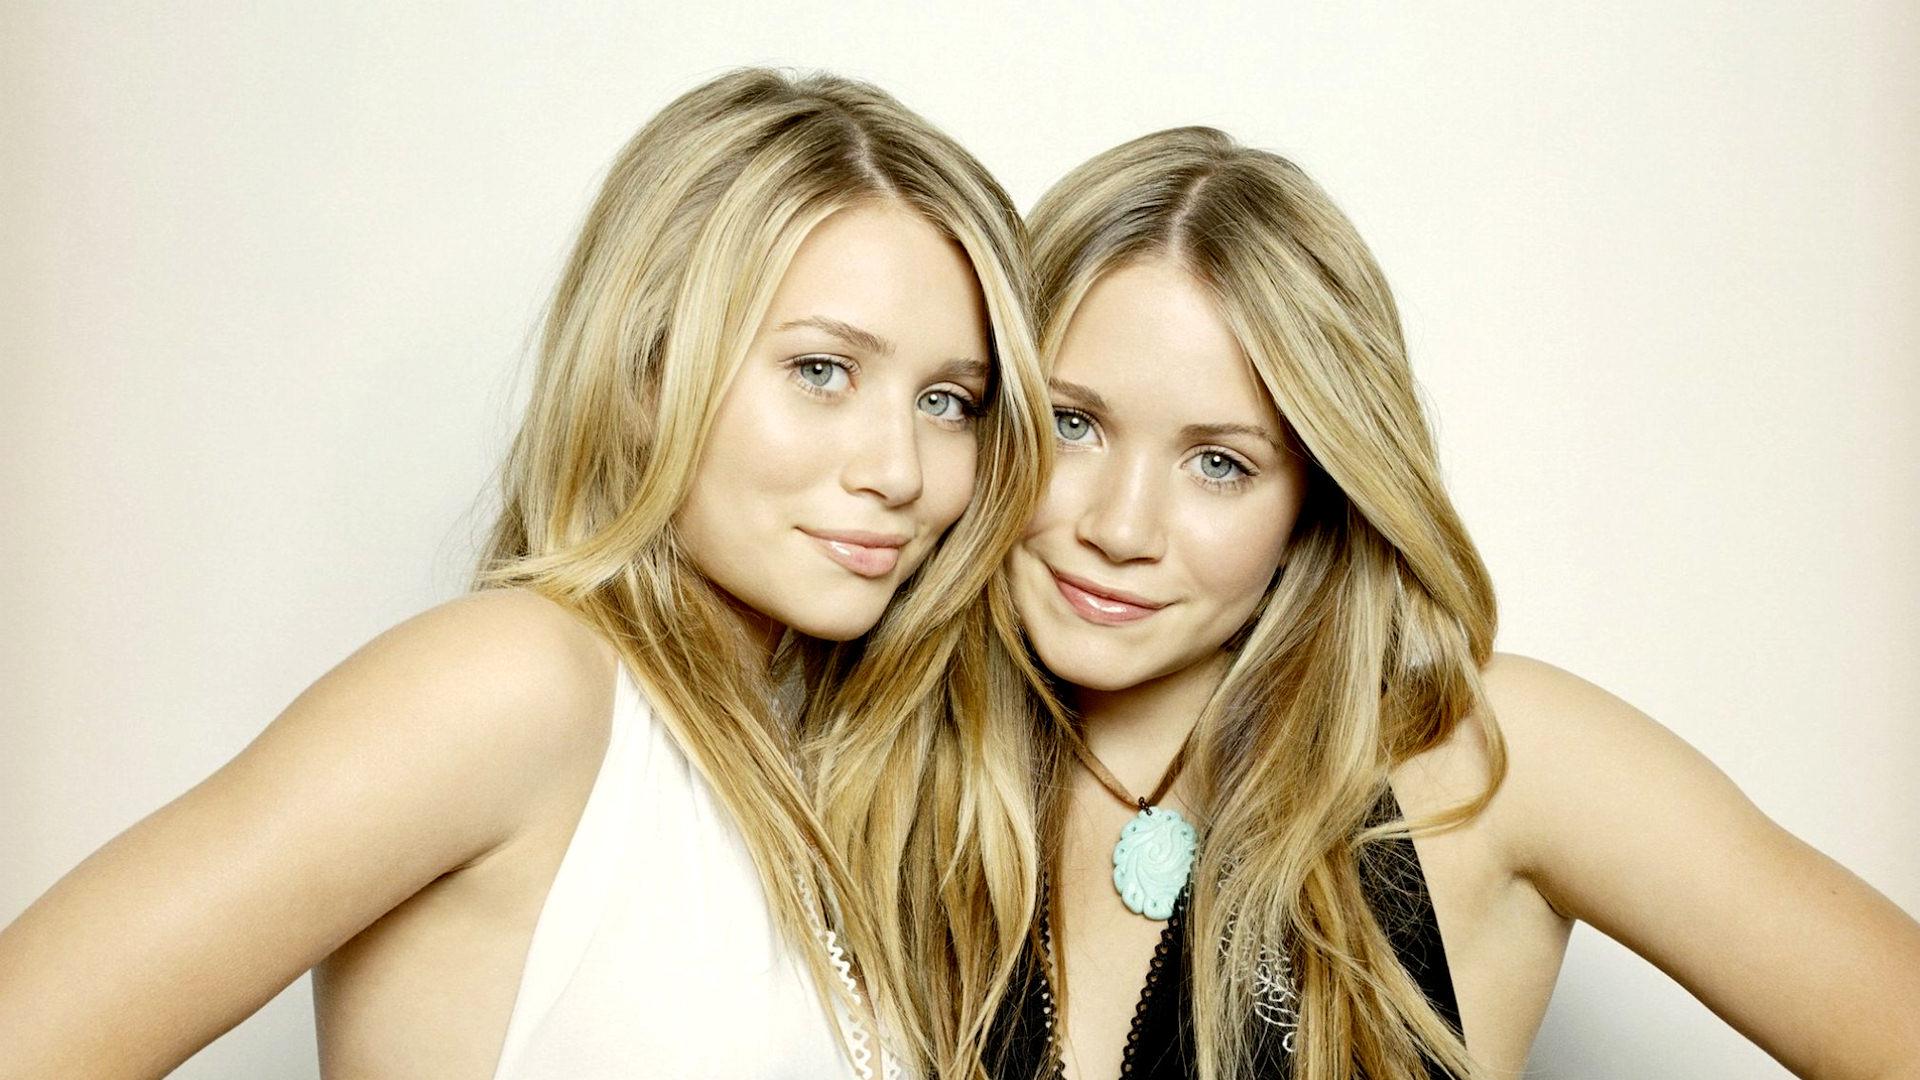 Olsen Twins wallpaper   442294 1920x1080